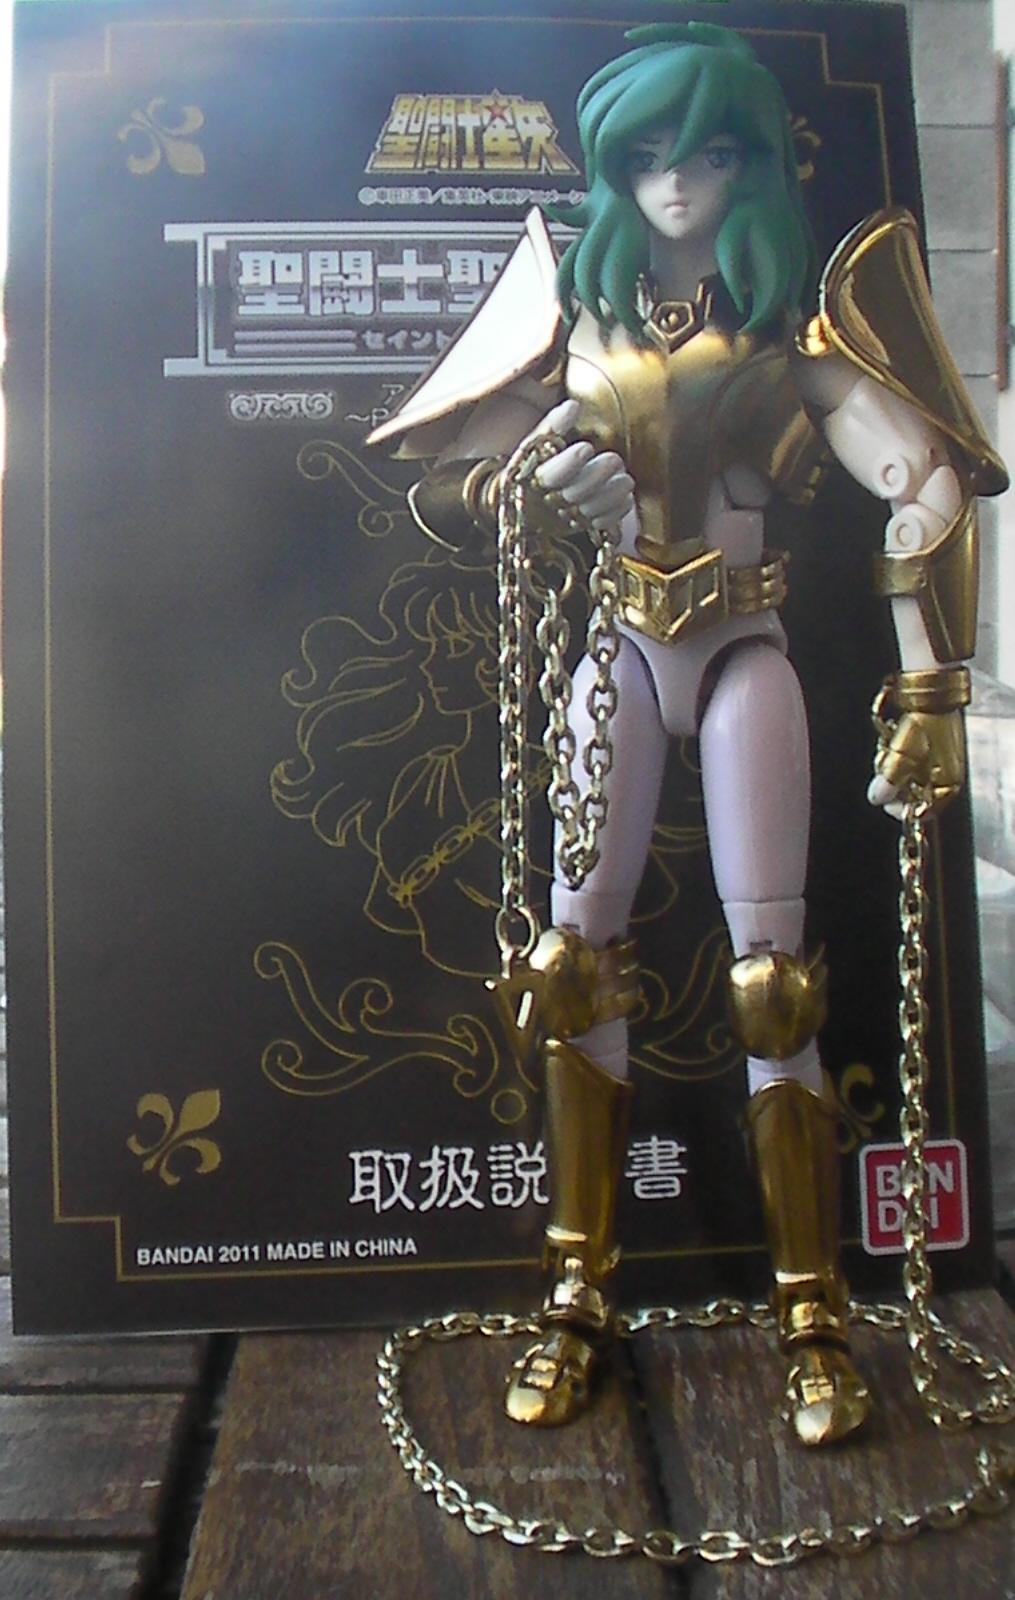 MC SHUN V3 Power of Gold